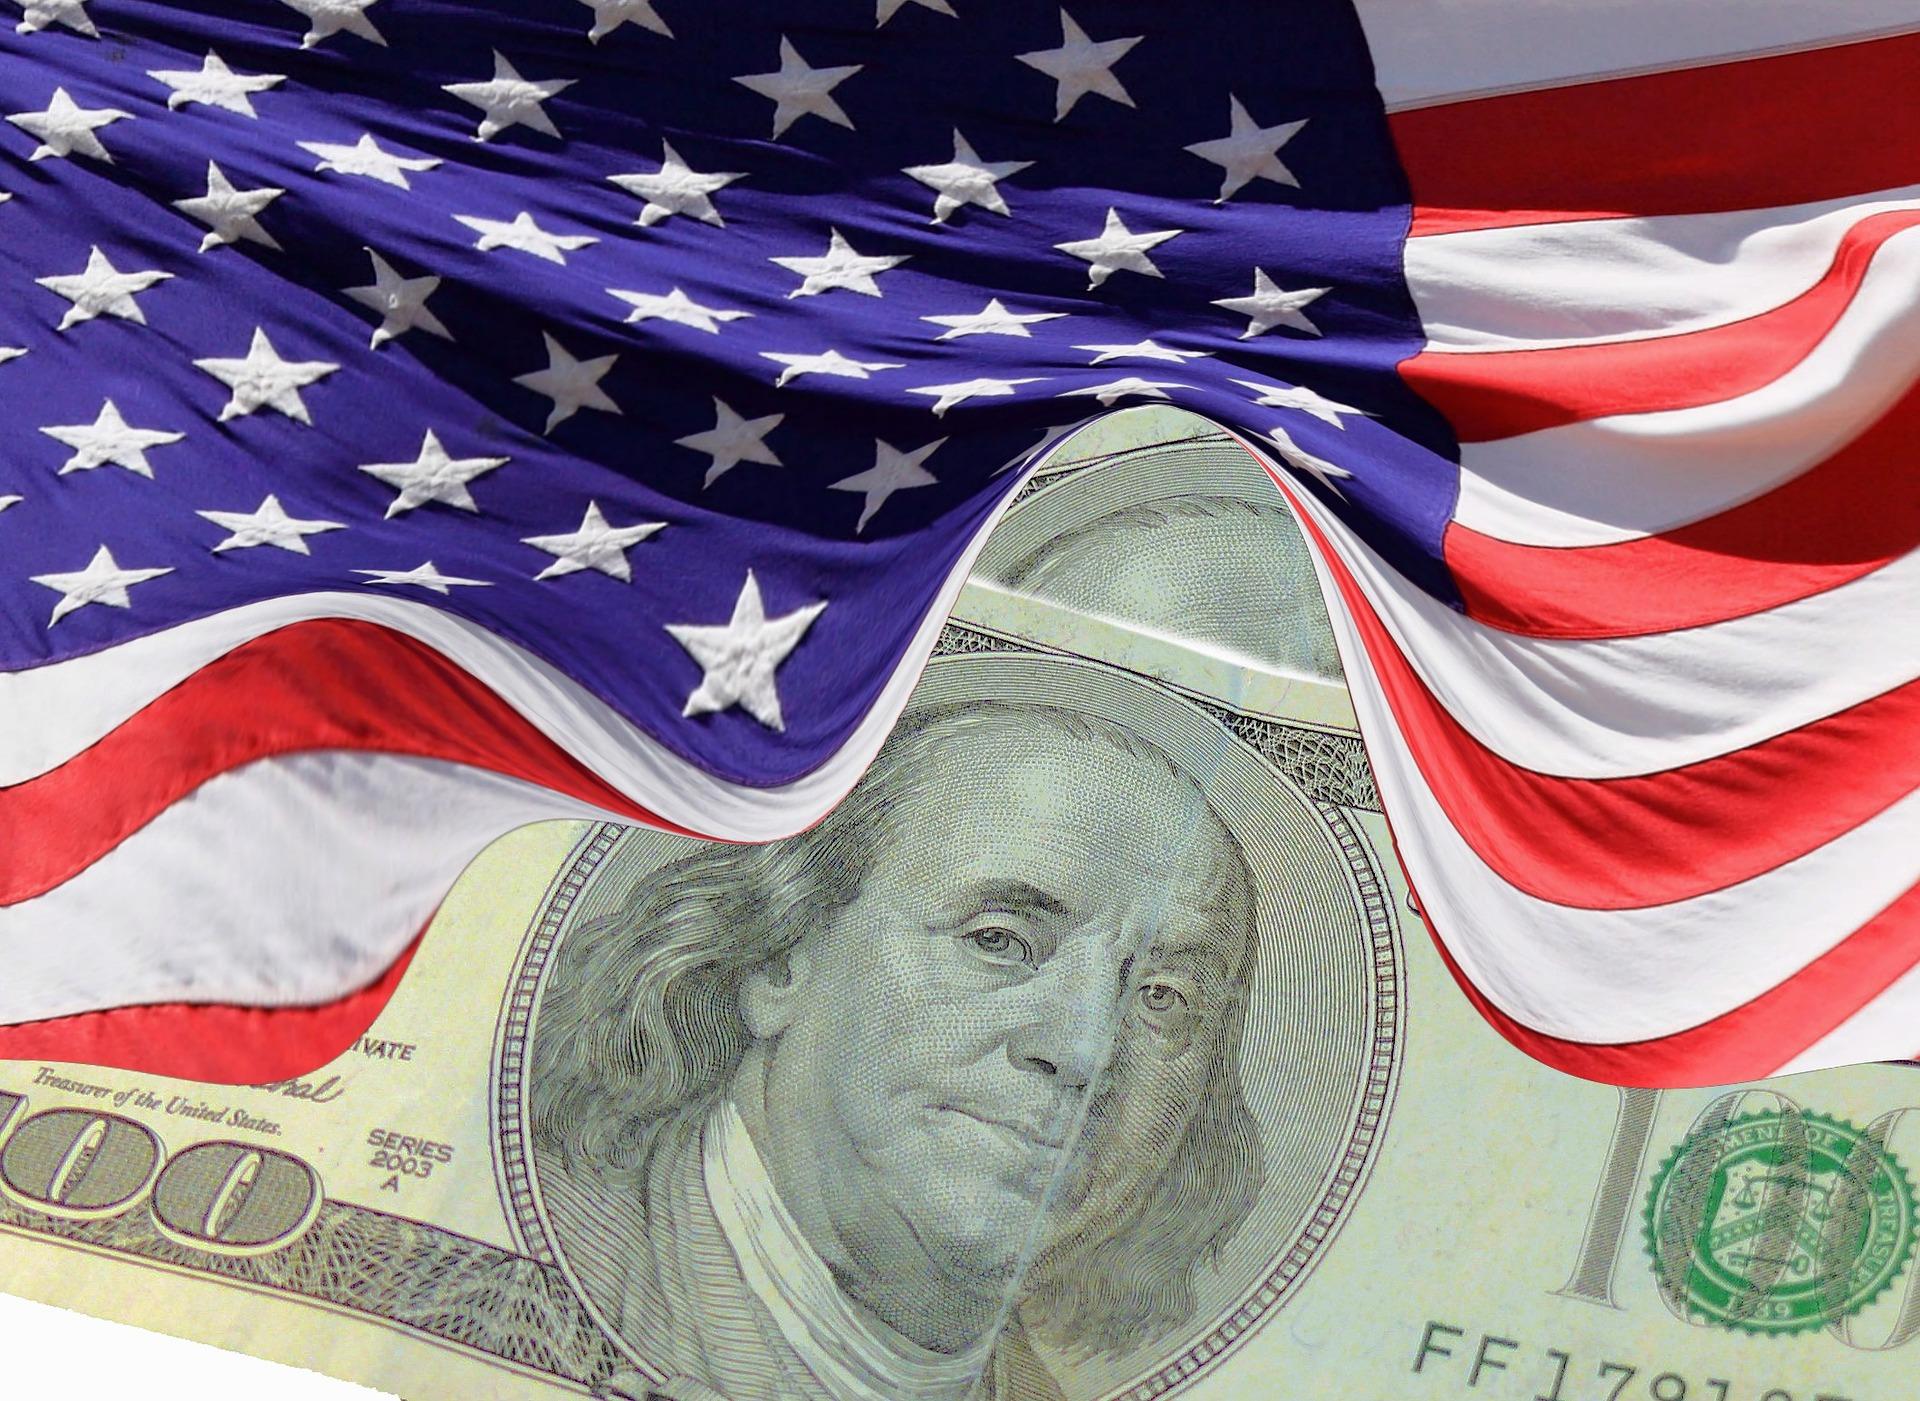 image of US flag with Benjamin Franklin dollar bill